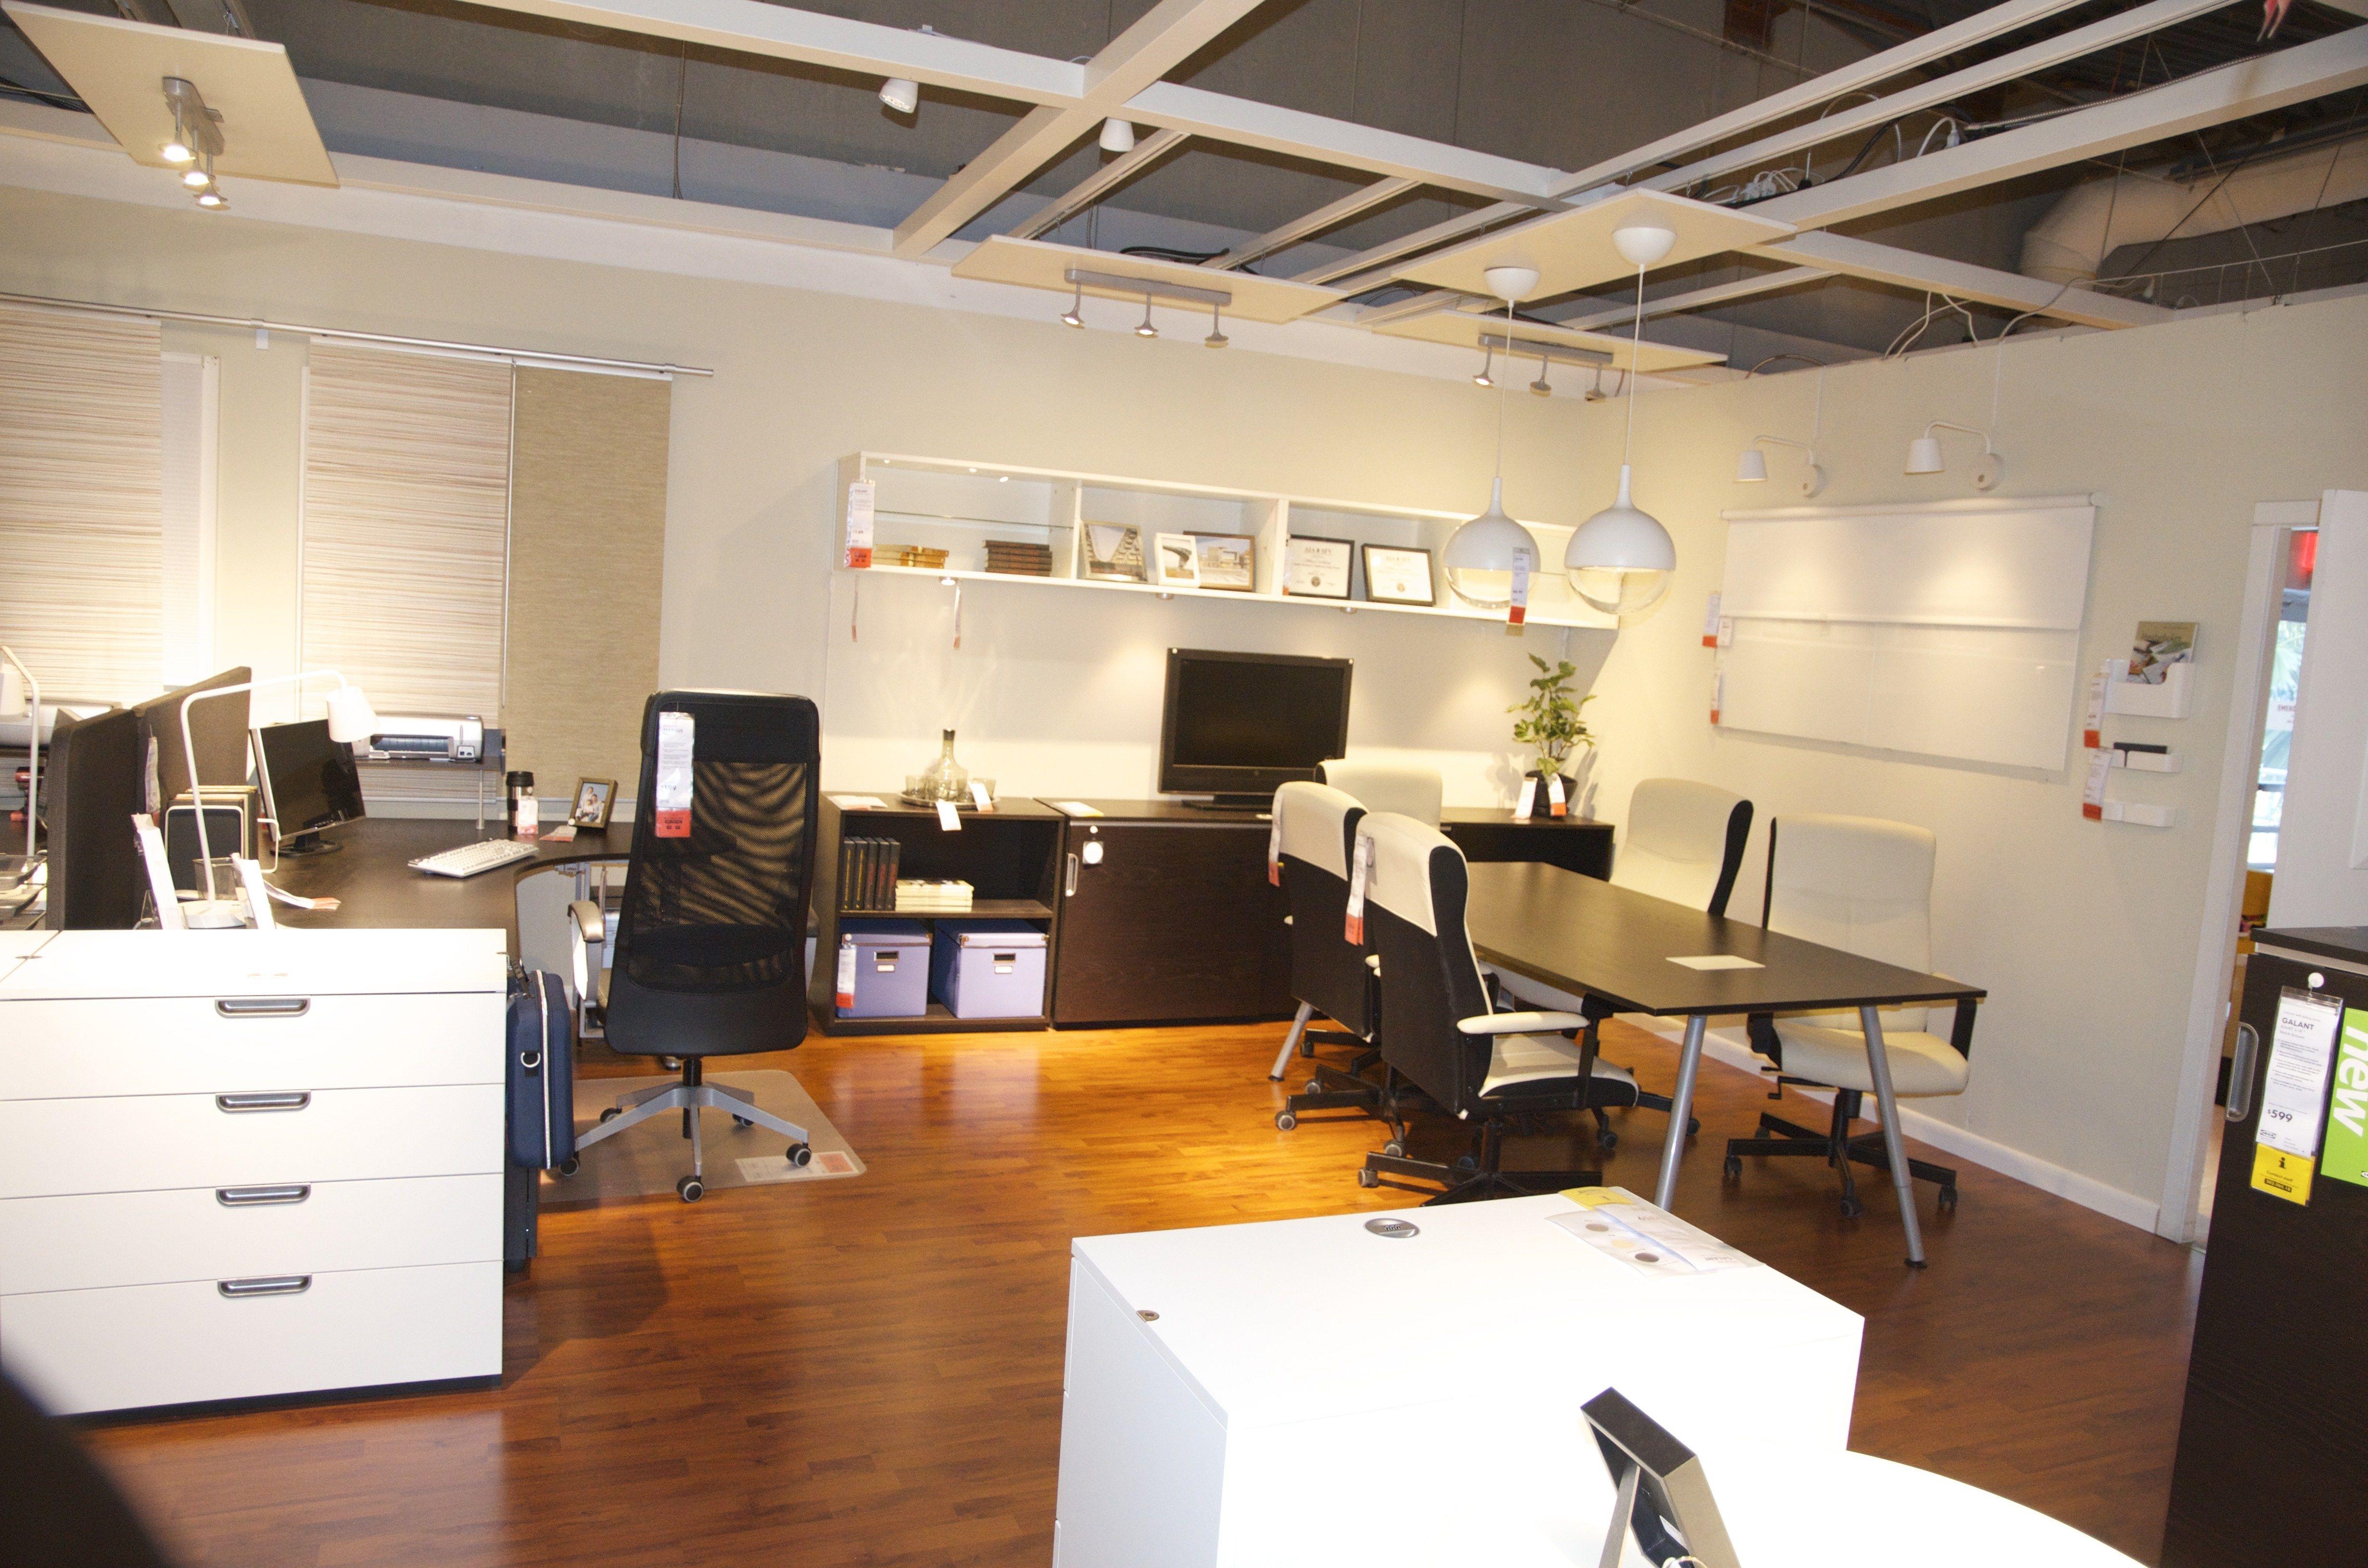 Garage Office Ideas Best 25+ Garage Office Ideas On Pinterest ...